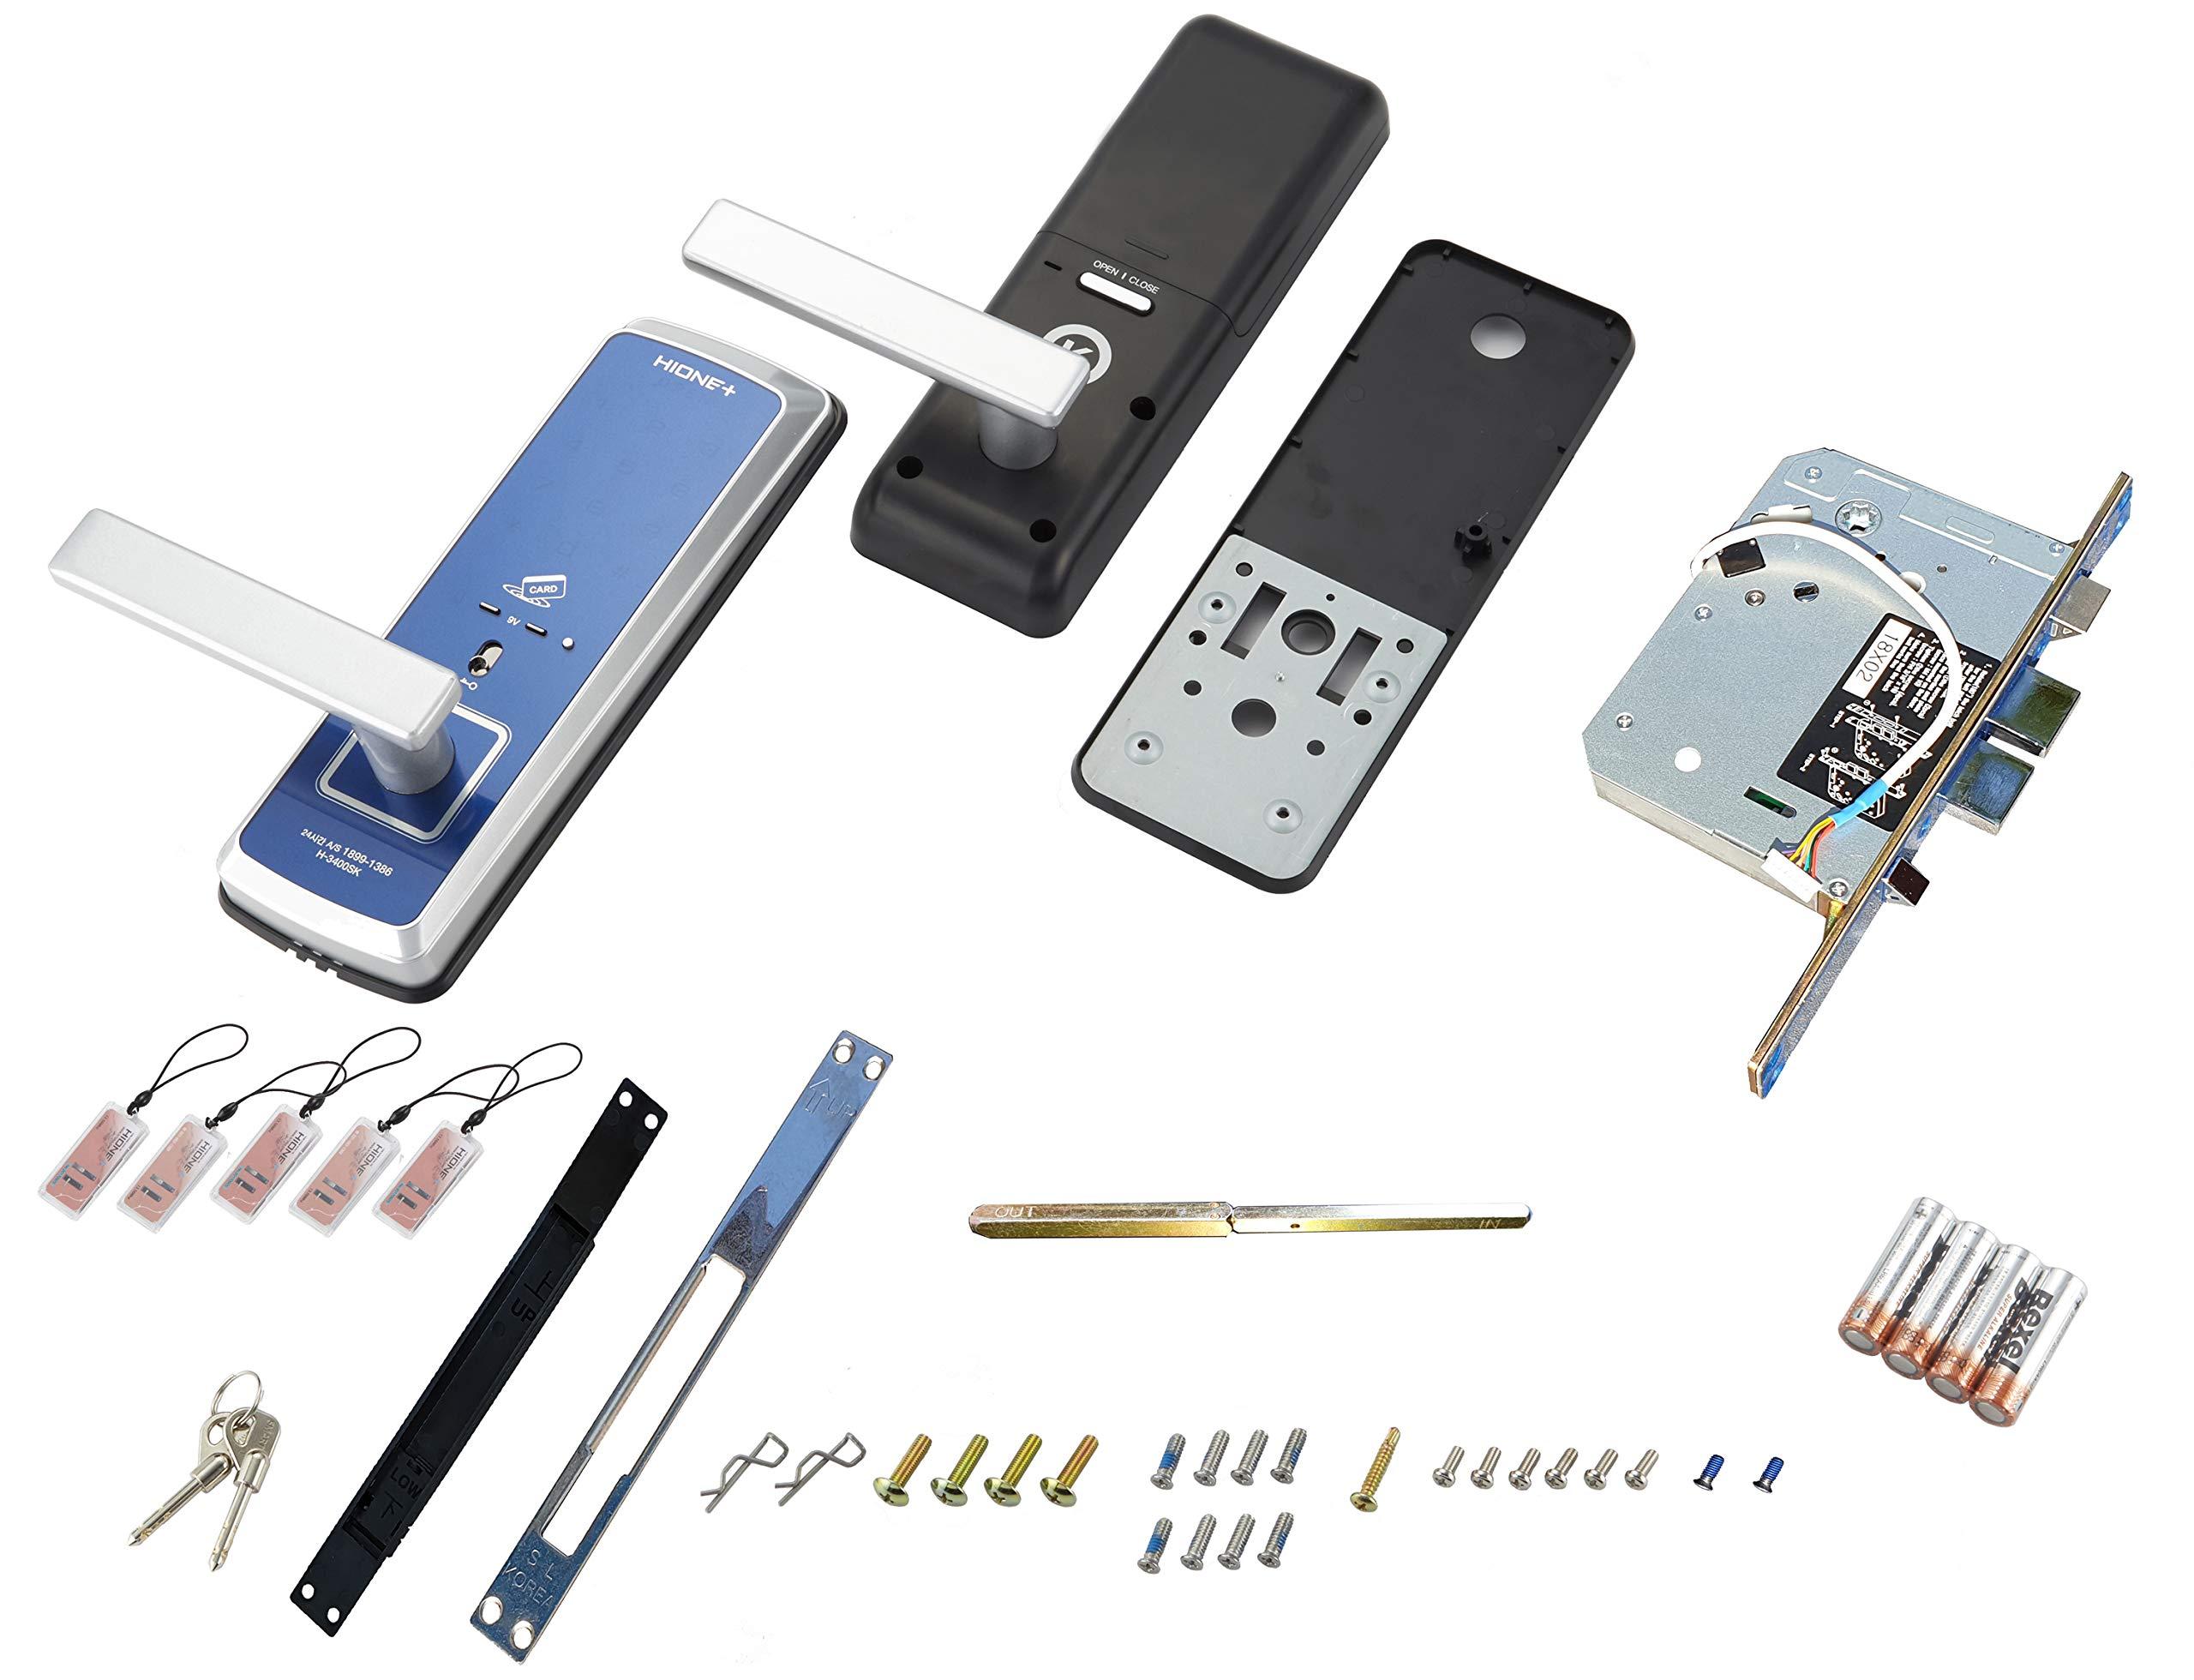 HionePlus H-3400SK, Digital Mini Main Door Lock, PIN+Card+Emergency Key by Hioneplus (Image #5)